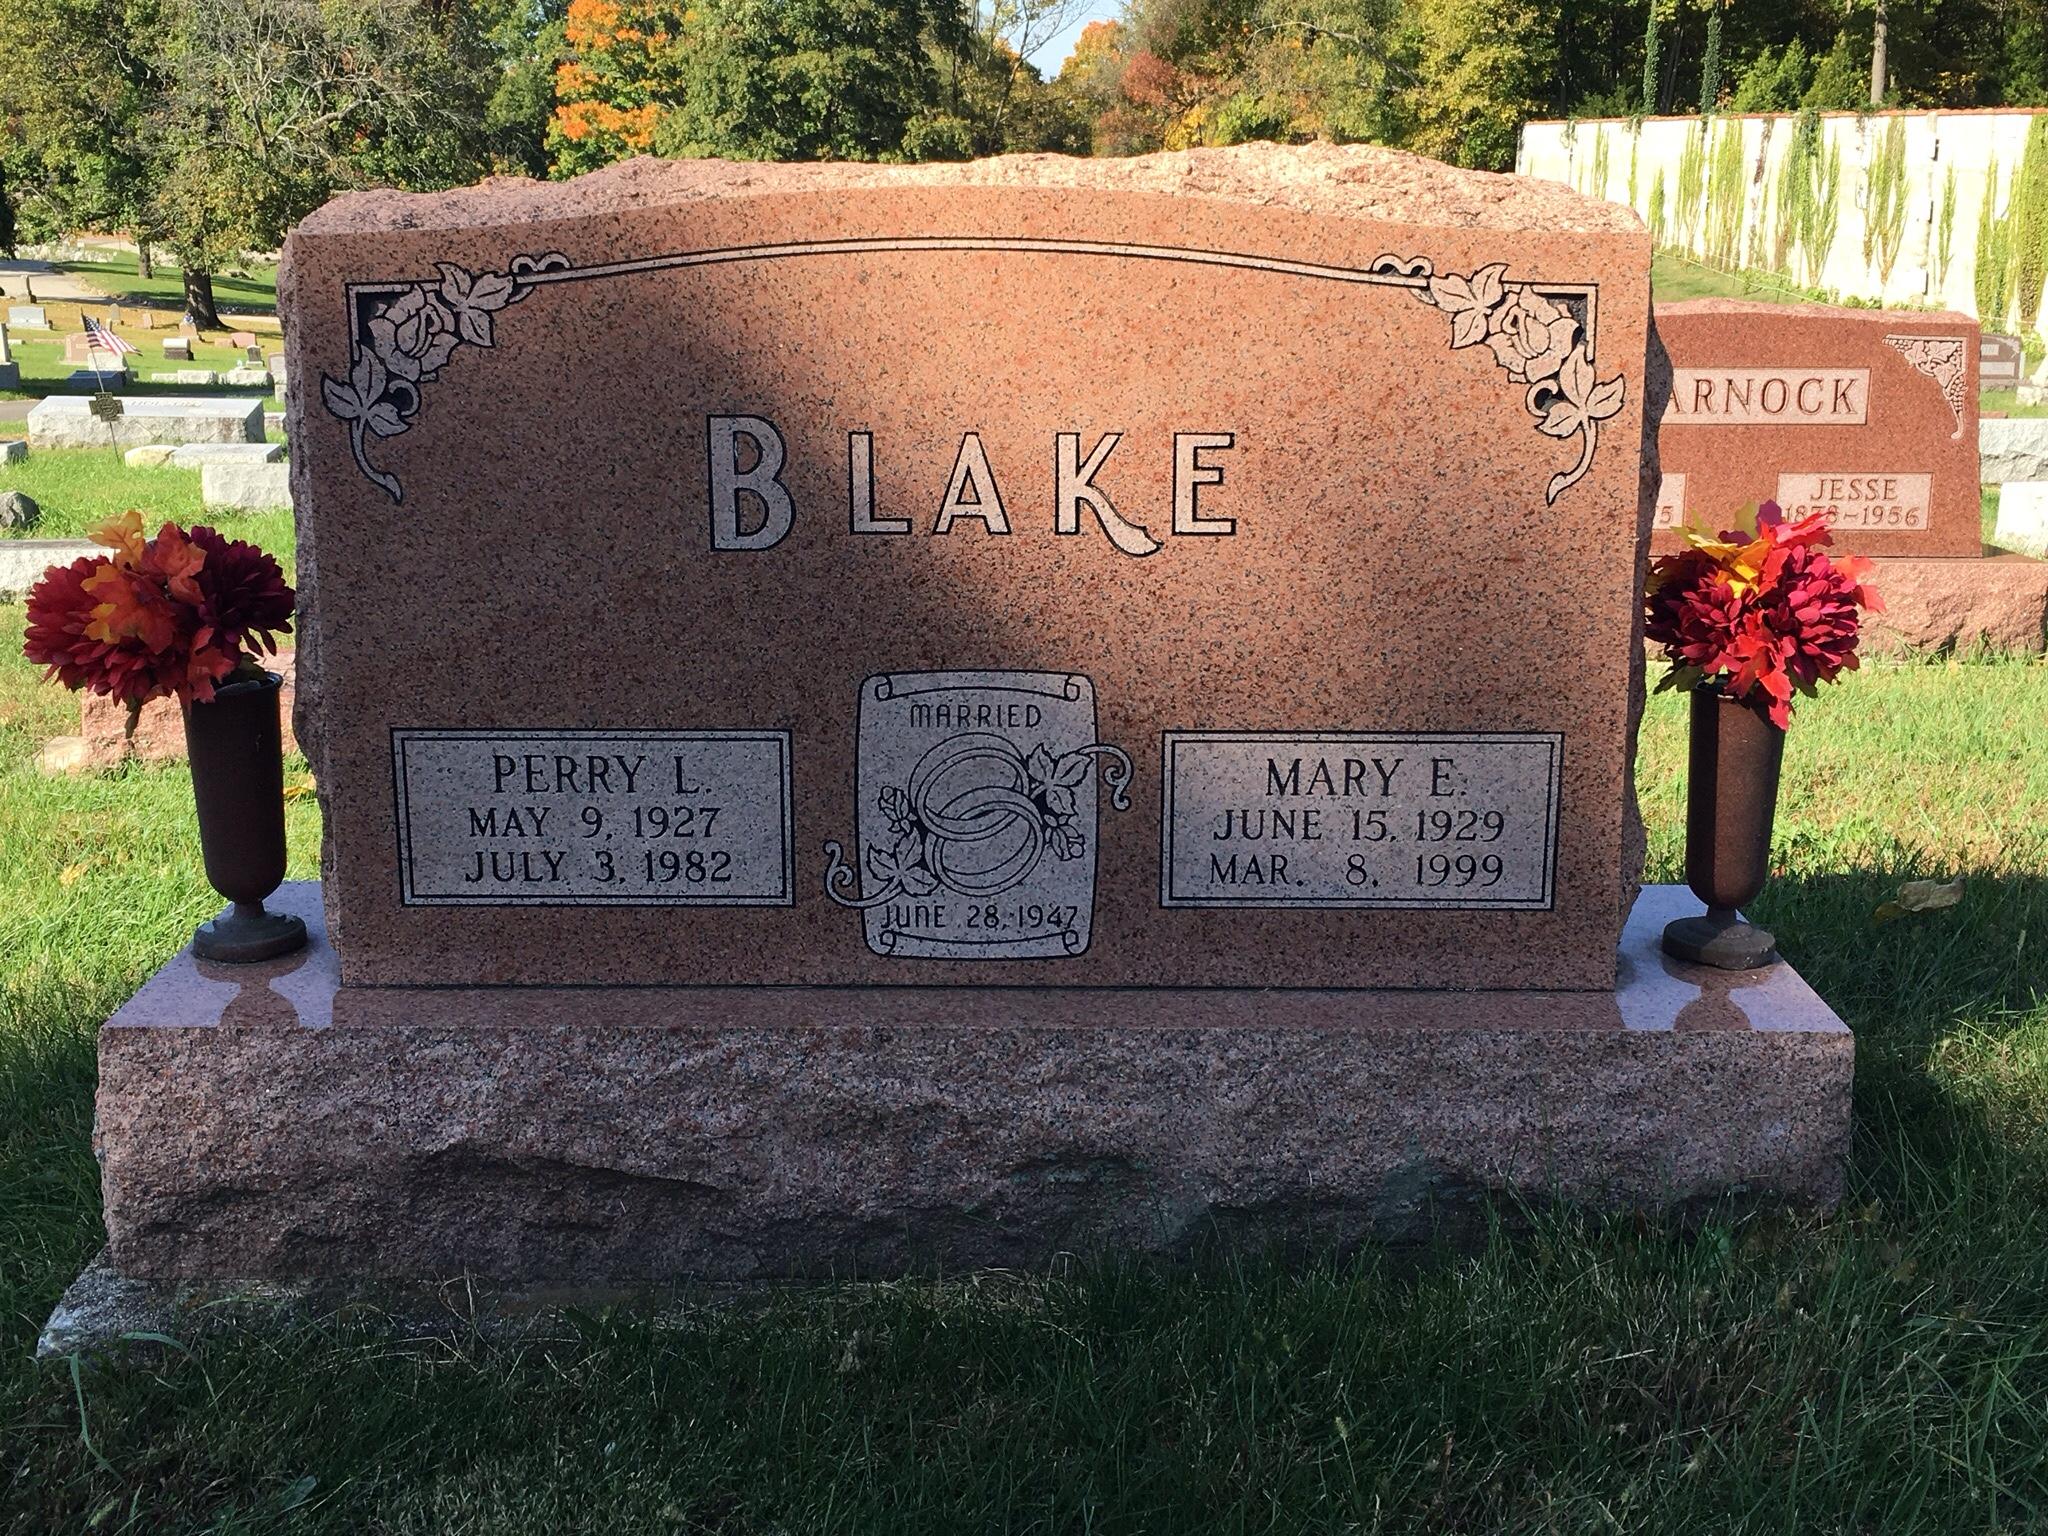 Lyman Blake